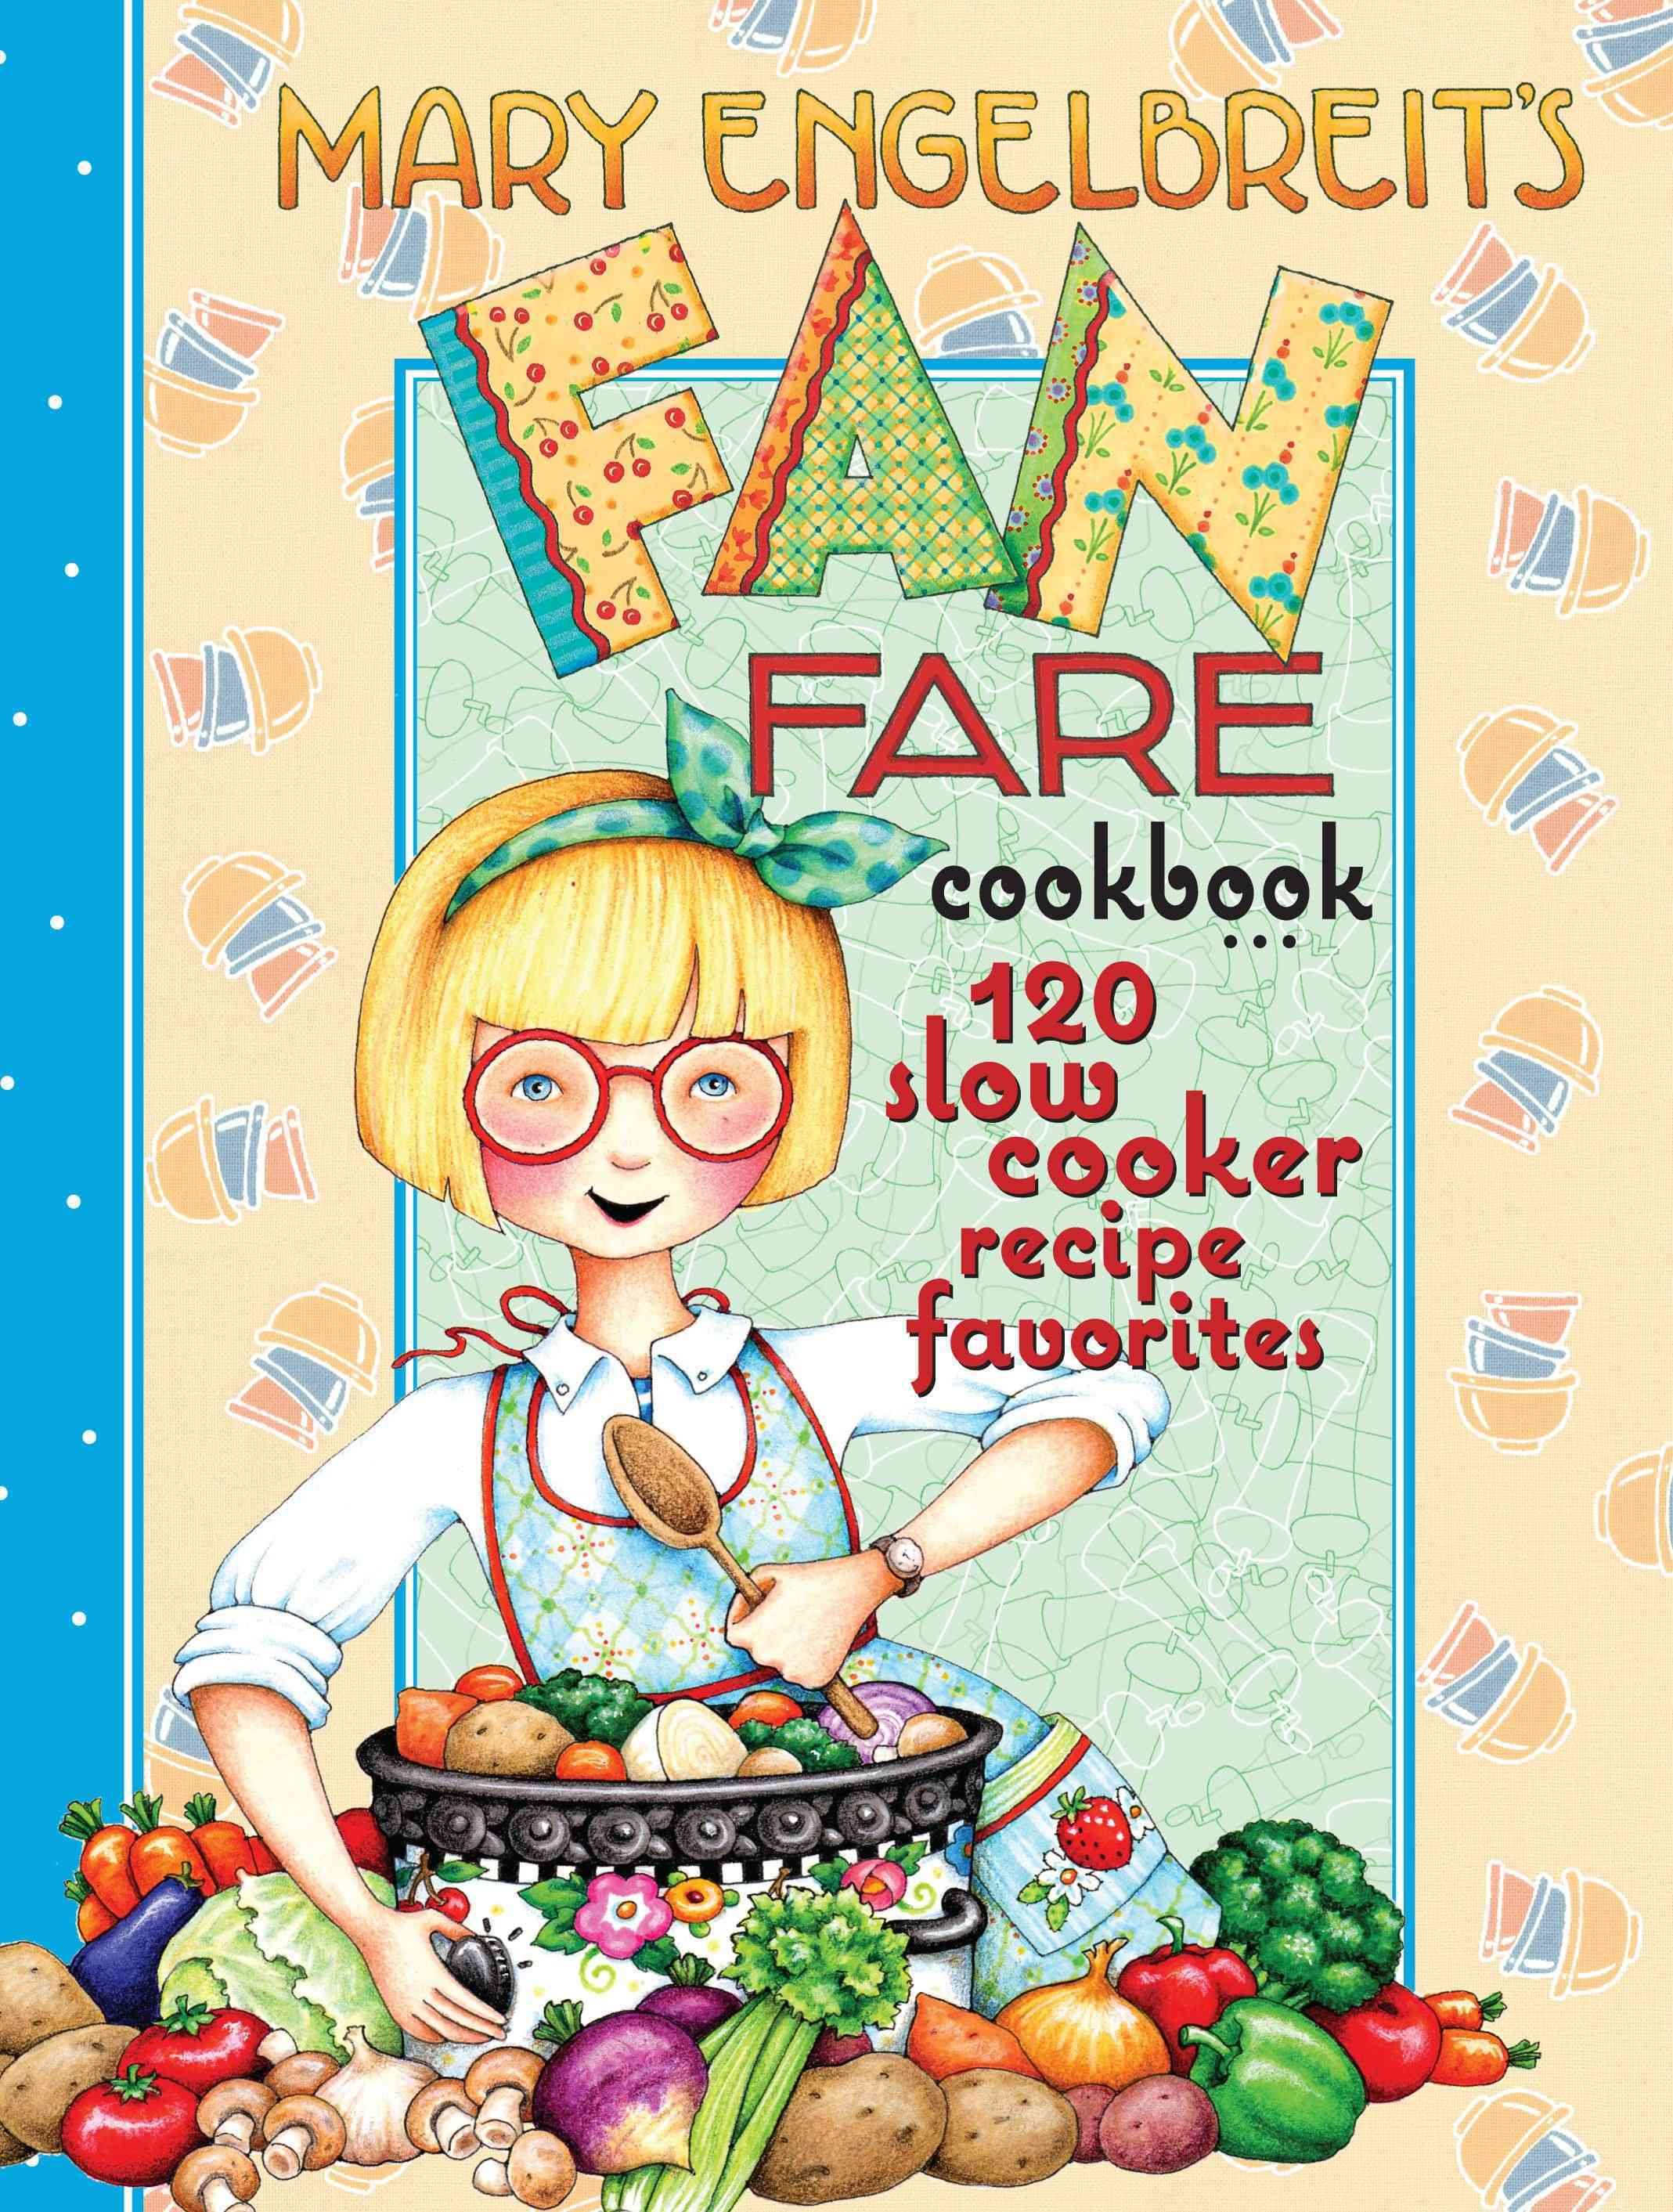 Mary Engelbreit's Fan Fare Cookbook: 120 Slow Cooker Recipe Favorites (Spiral bound)